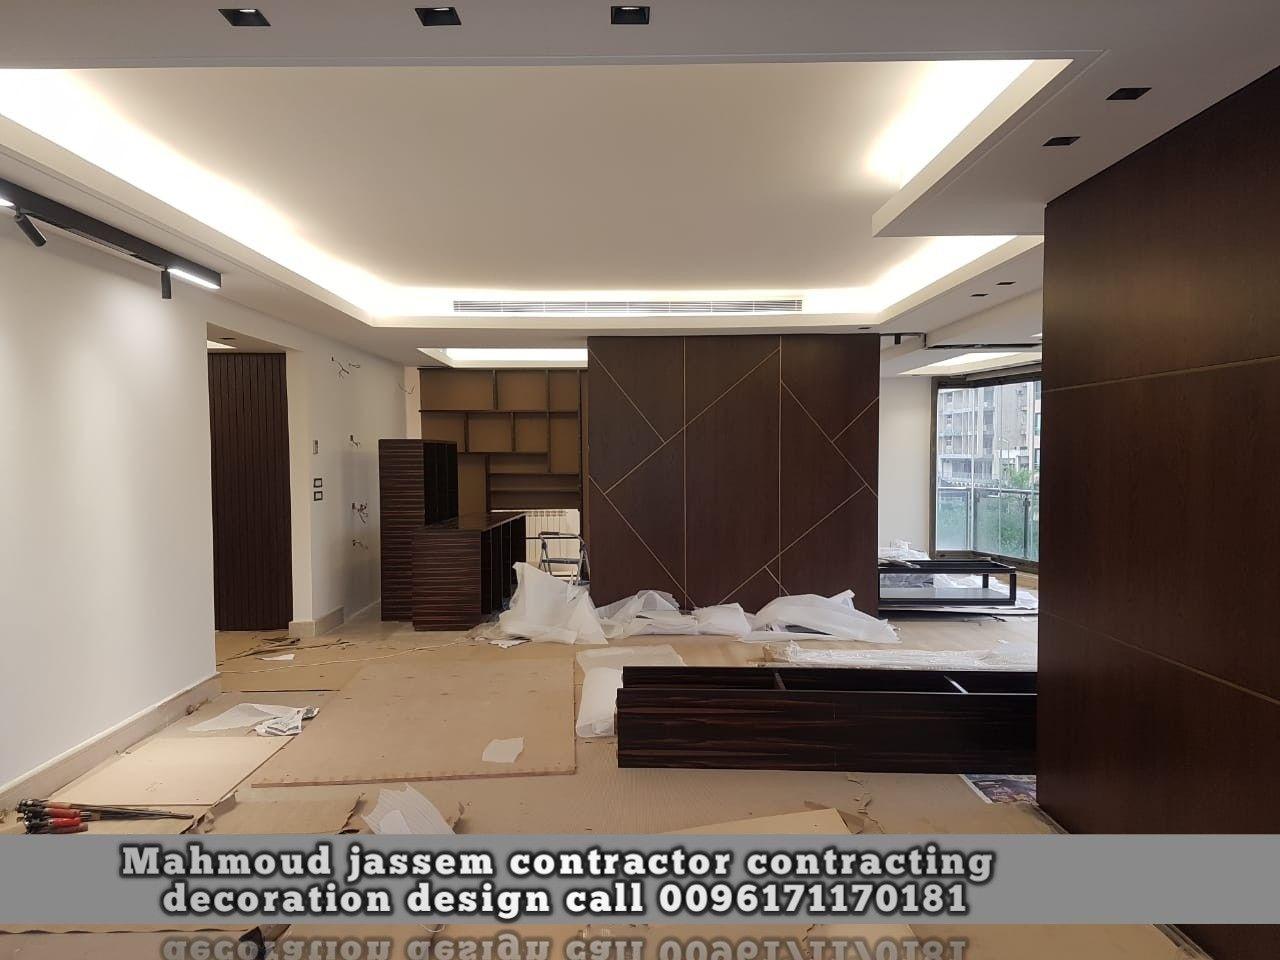 87d0028715d16 modern contracting Mahmoud Lebanon call 0096171170181 contractor home decor  house ideas idea design wallpaper gypsum wood